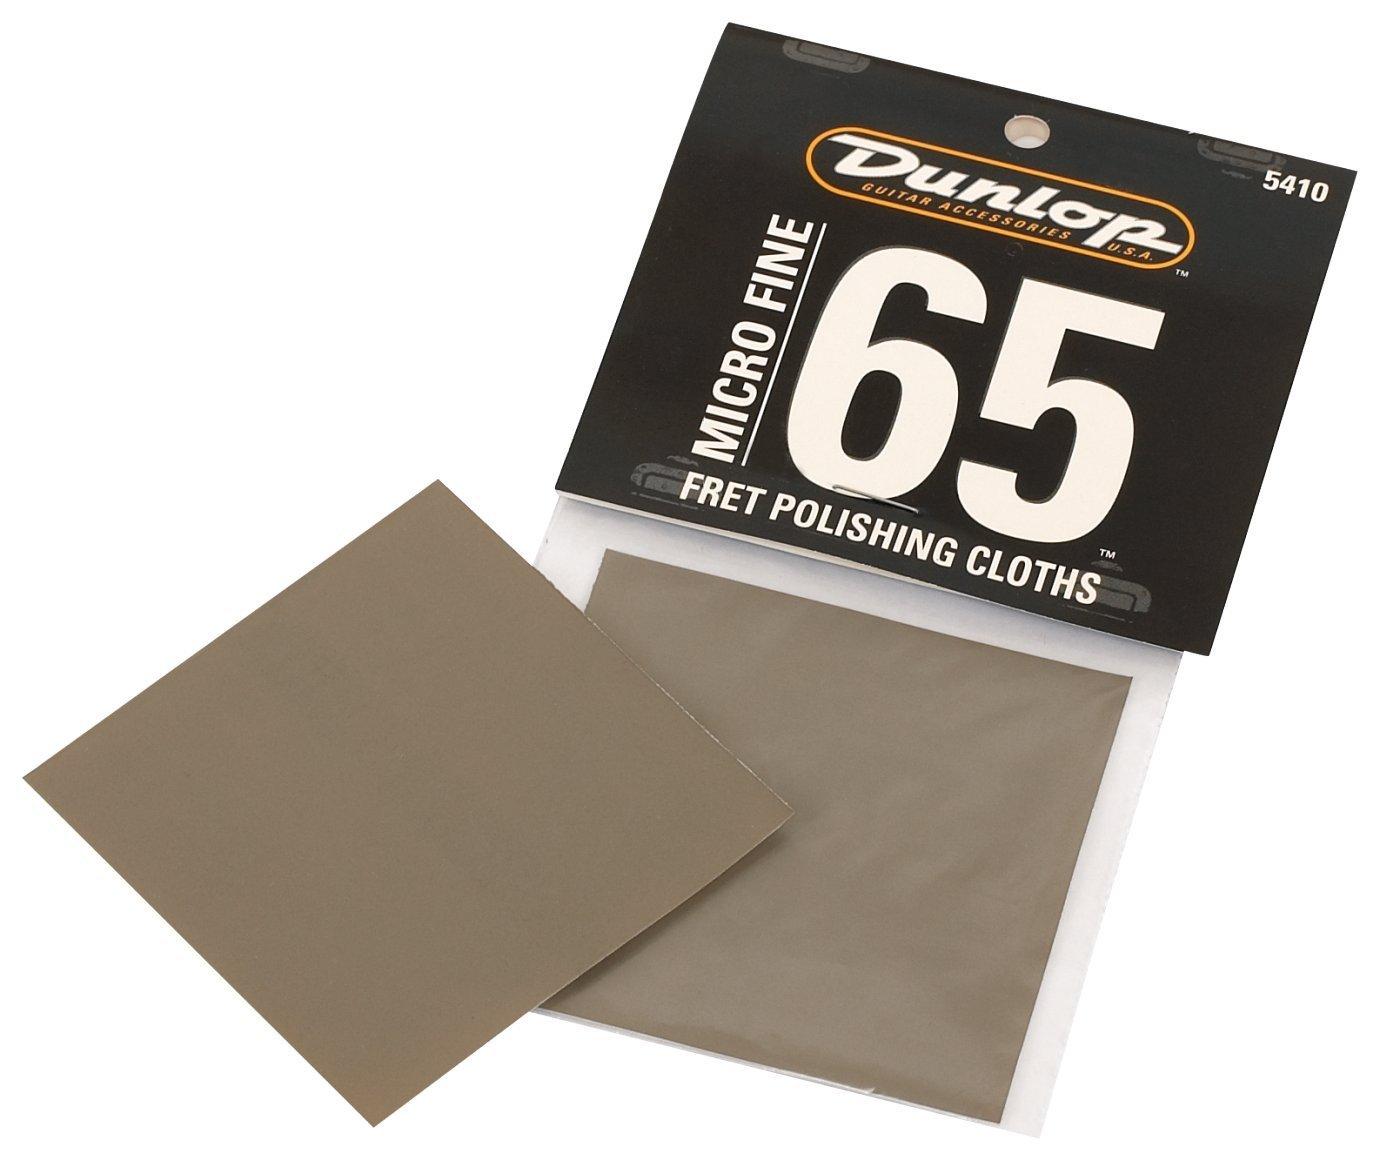 Dunlop 5410 paño de pulido Micro traste, 2/Bg